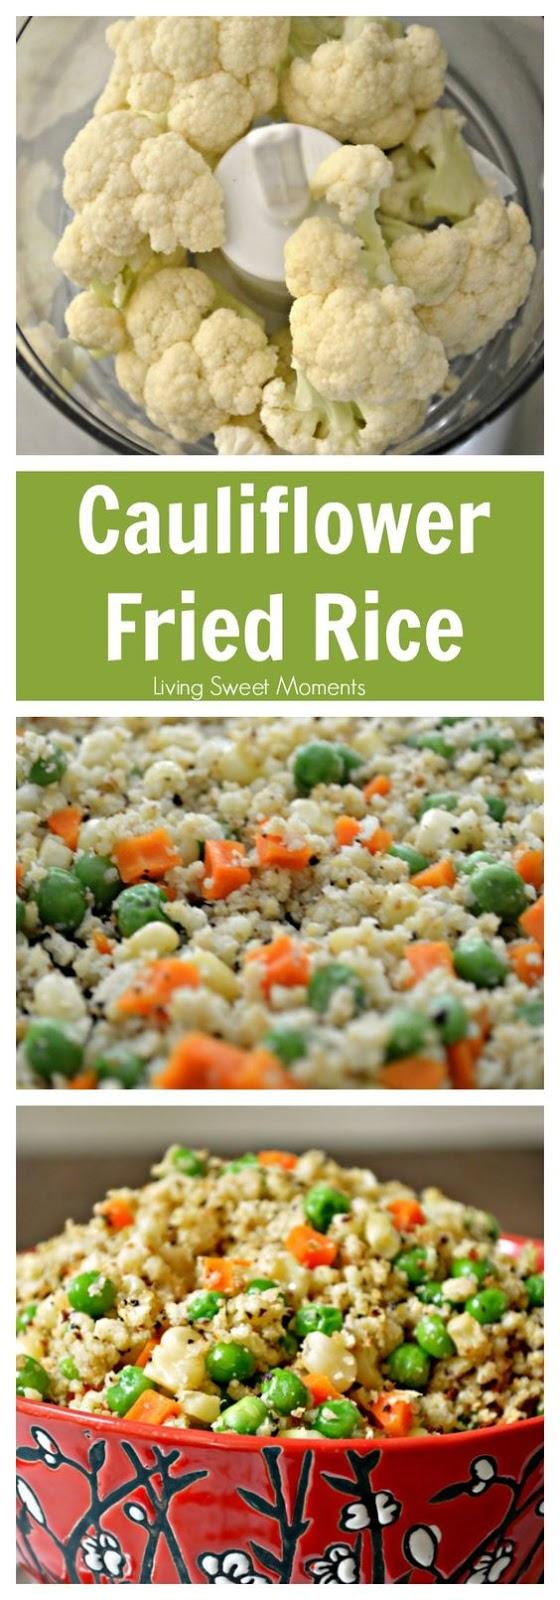 DELICIOUS CAULIFLOWER FRIED RICE #cauliflower #friedrice #deliciousfood #healthyrecipes #healthyfood